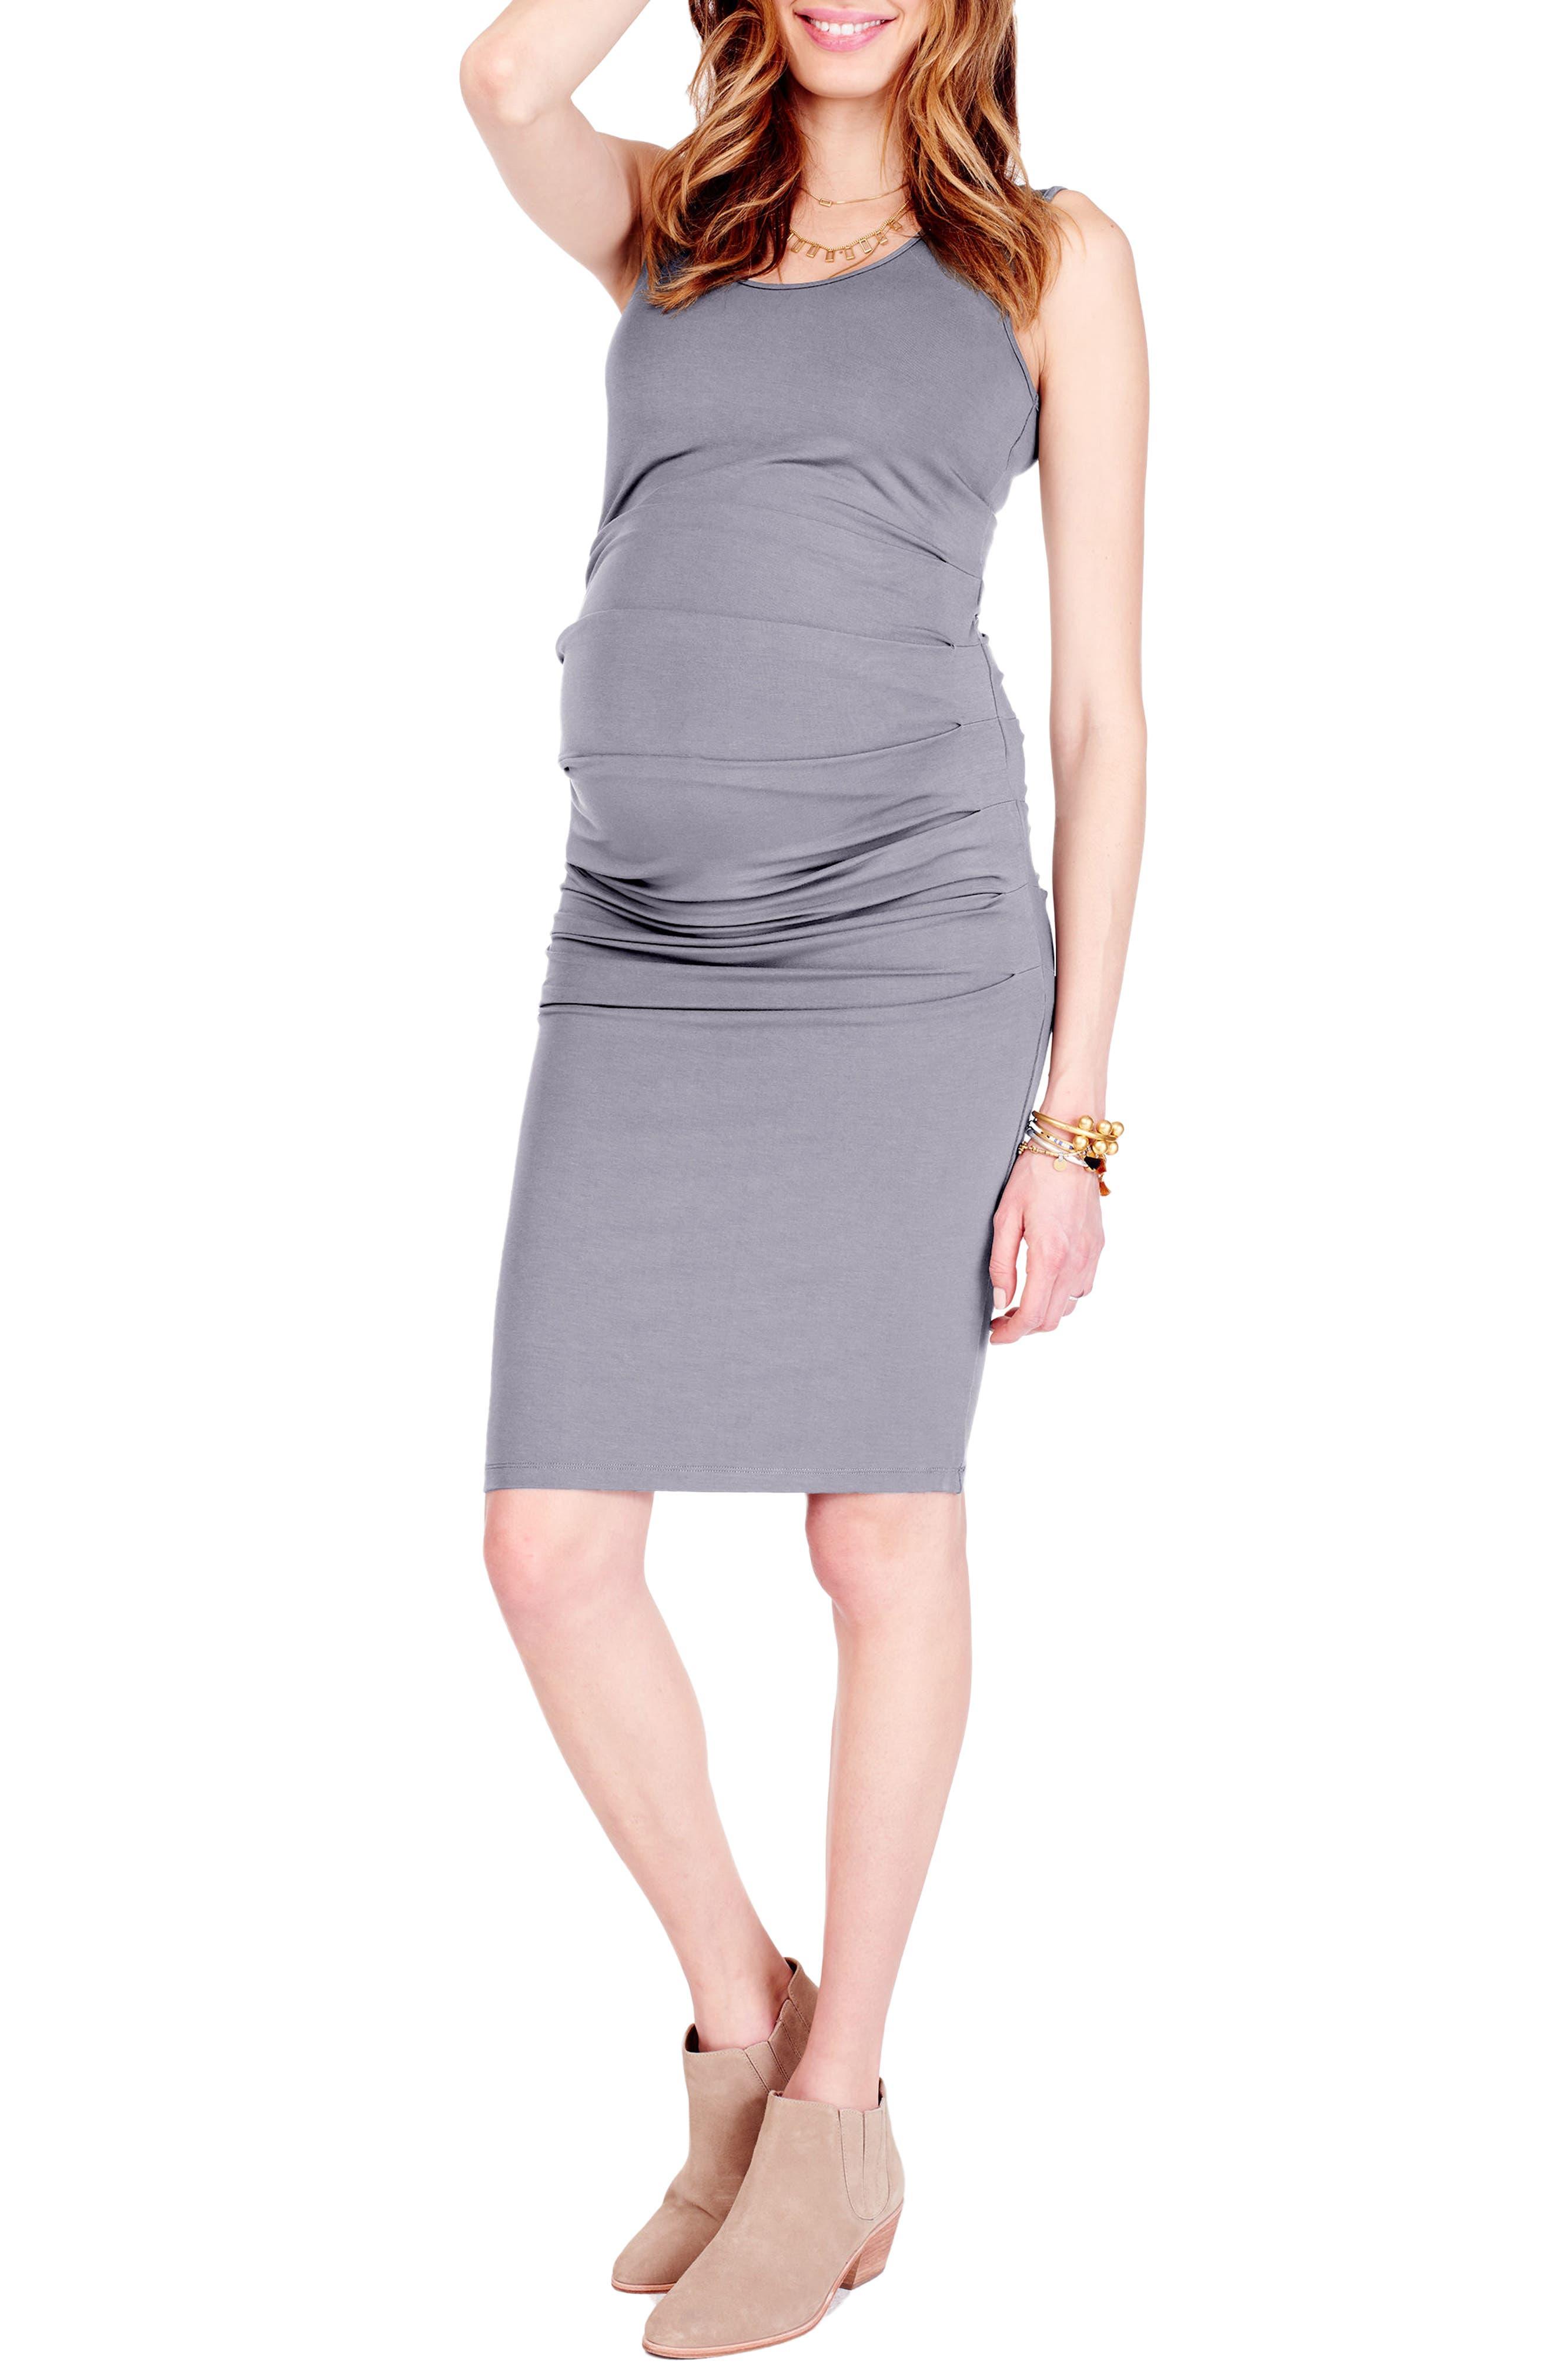 Main Image - Ingrid & Isabel® Ruched Maternity Tank Dress